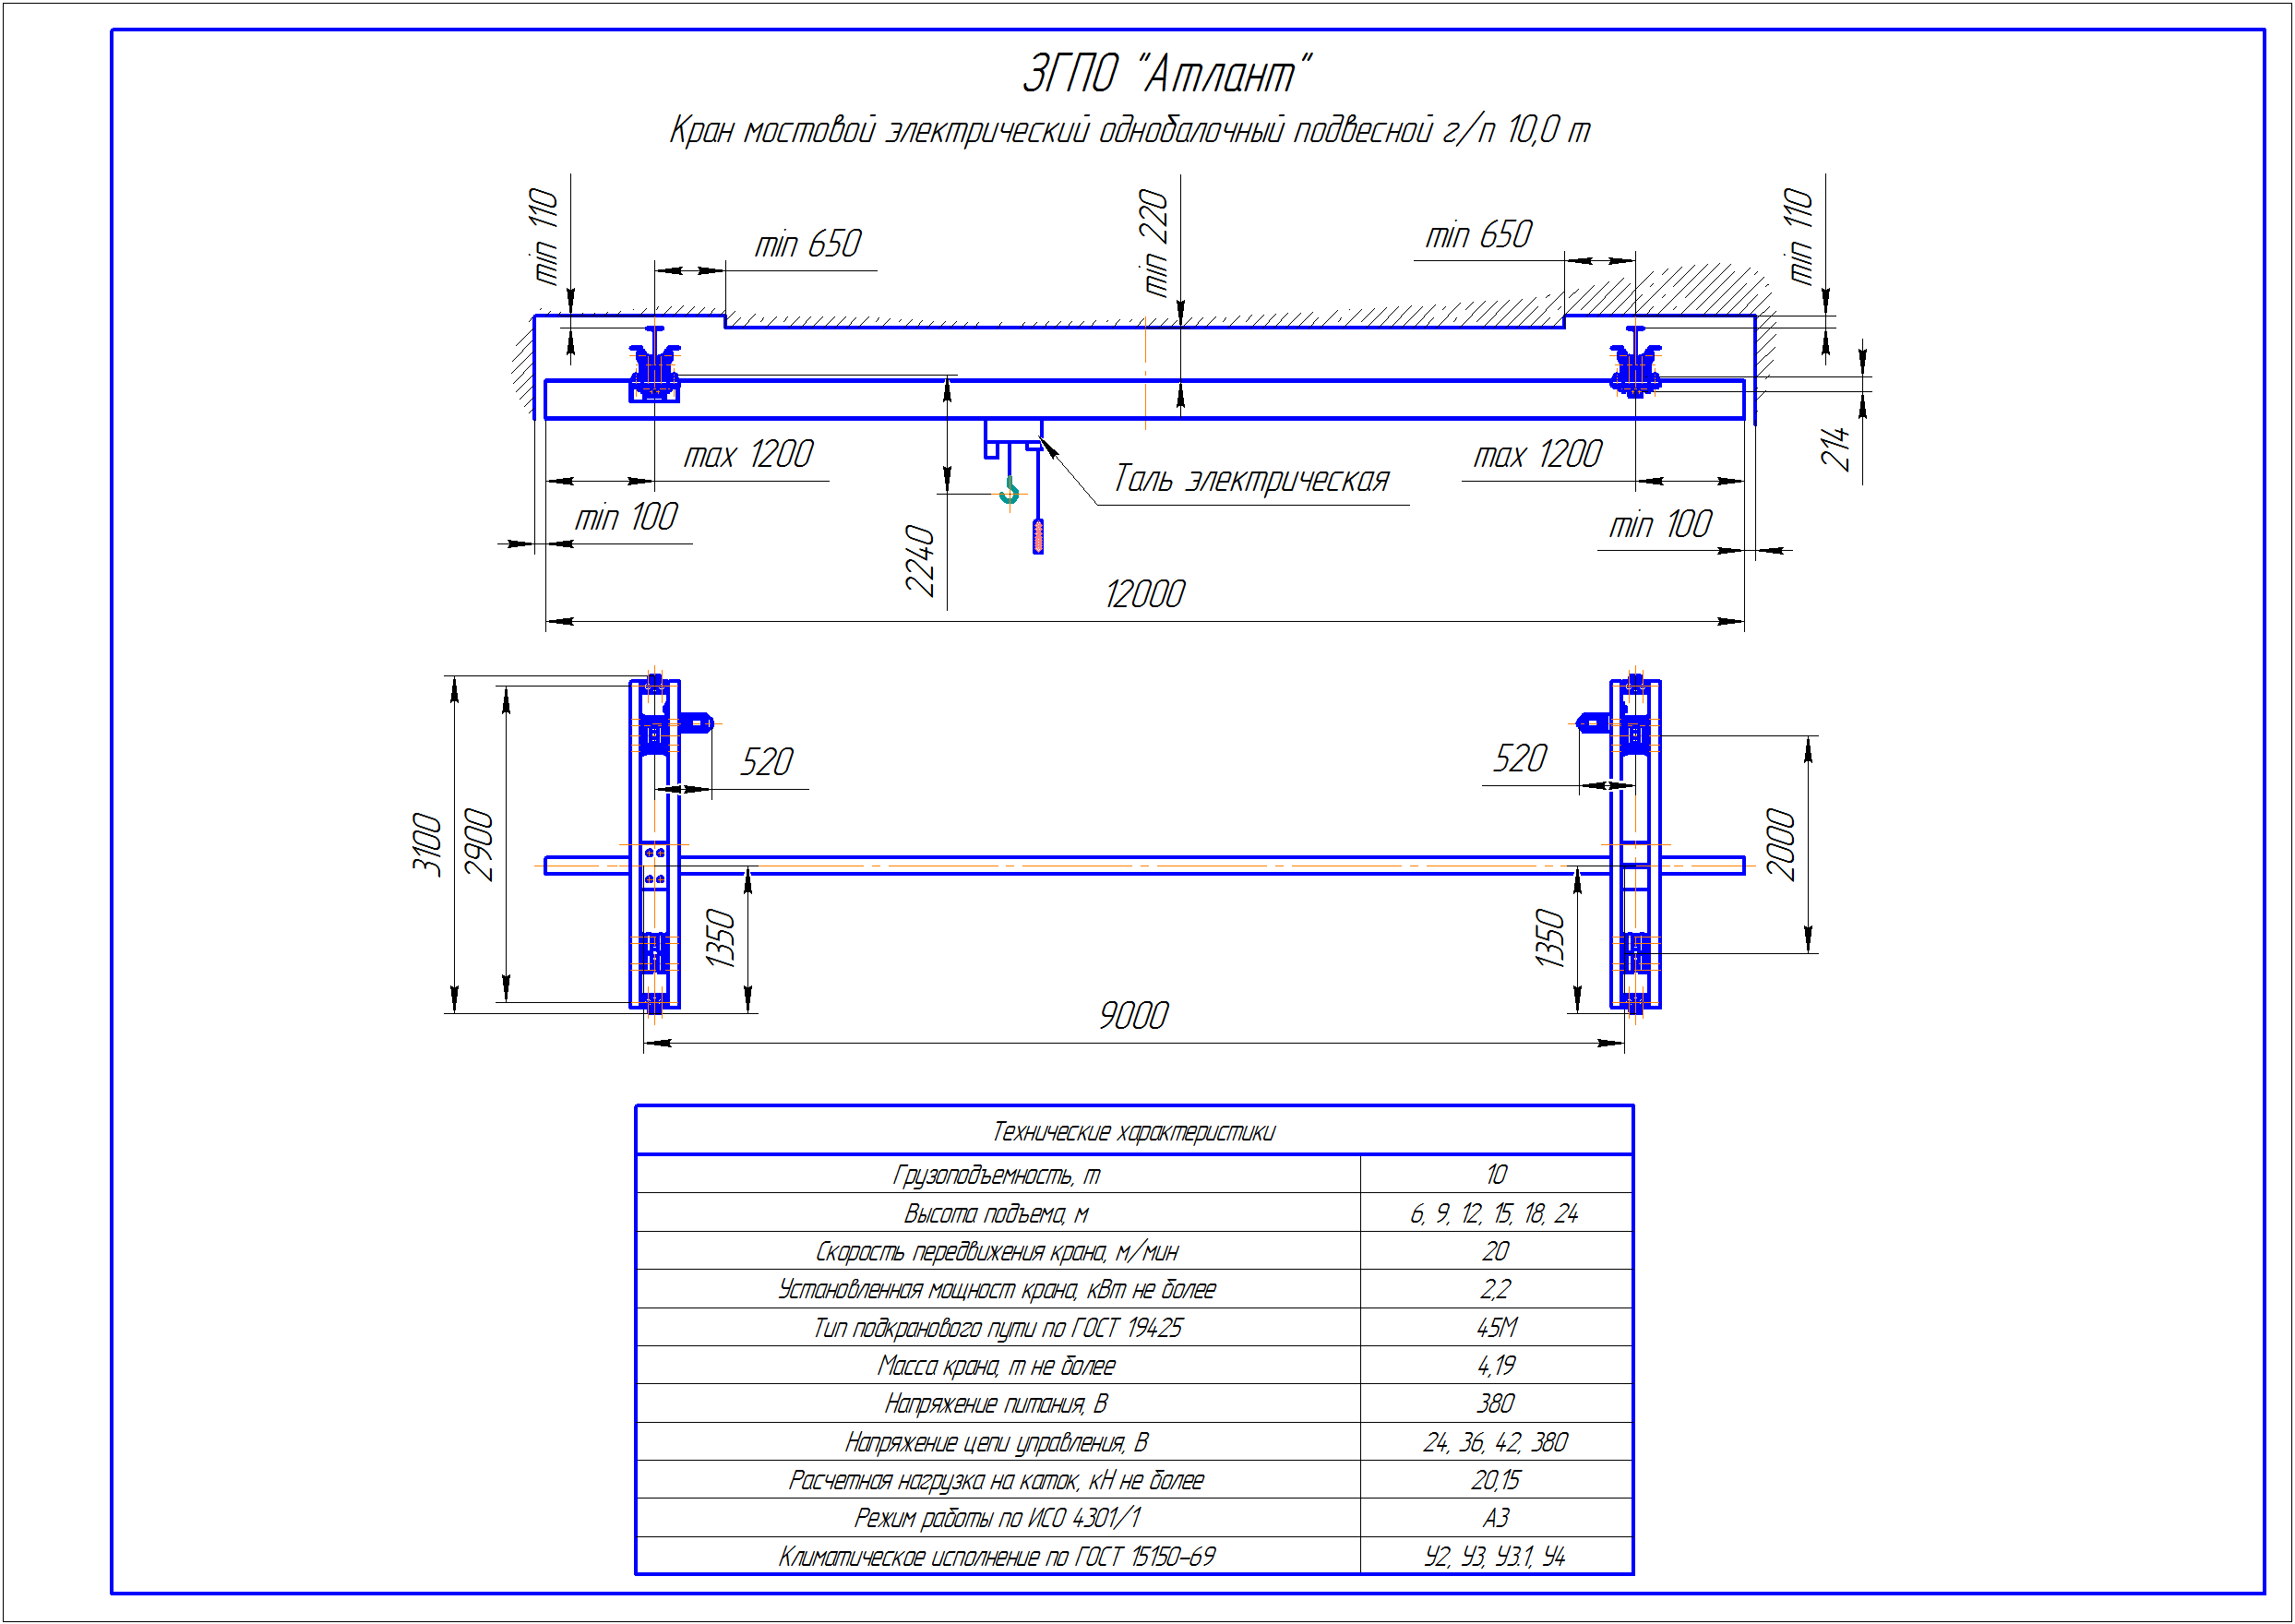 KBP 7 3 - Подвесная кран балка